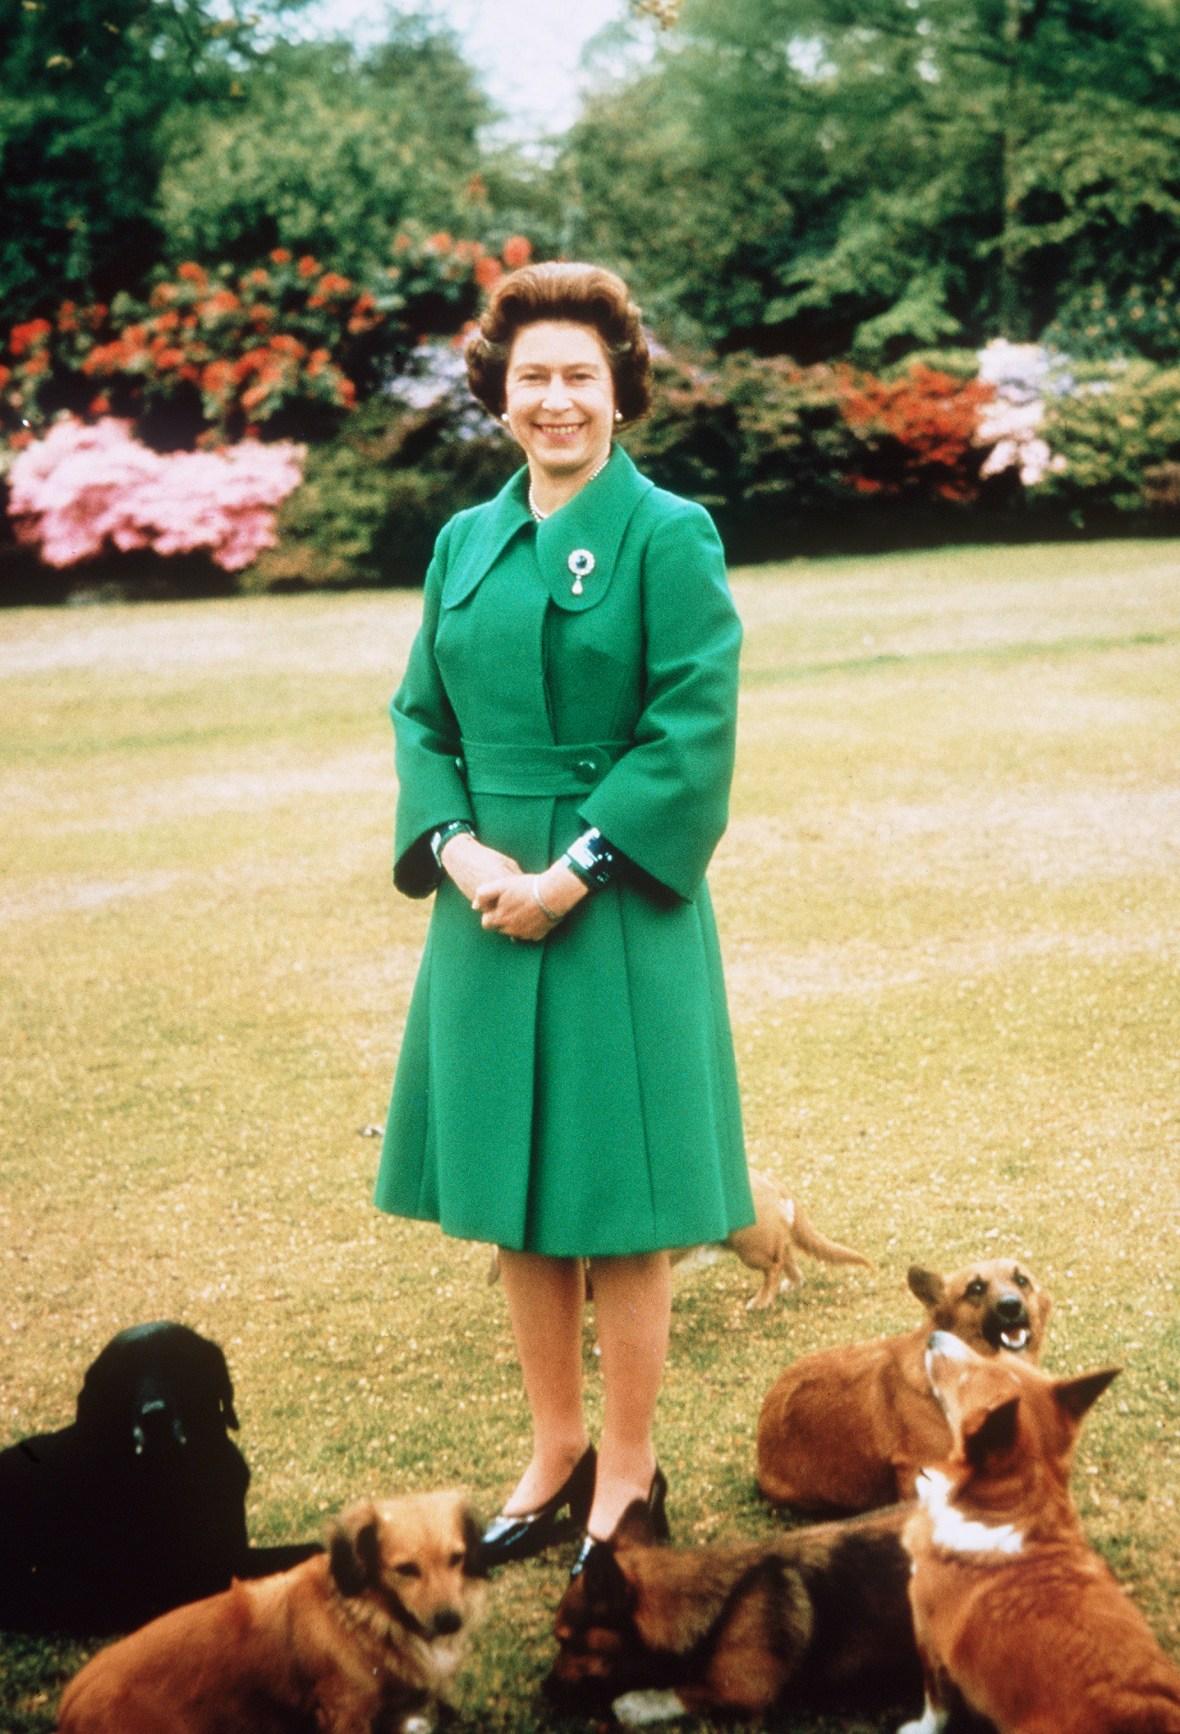 queen elizabeth corgis getty images